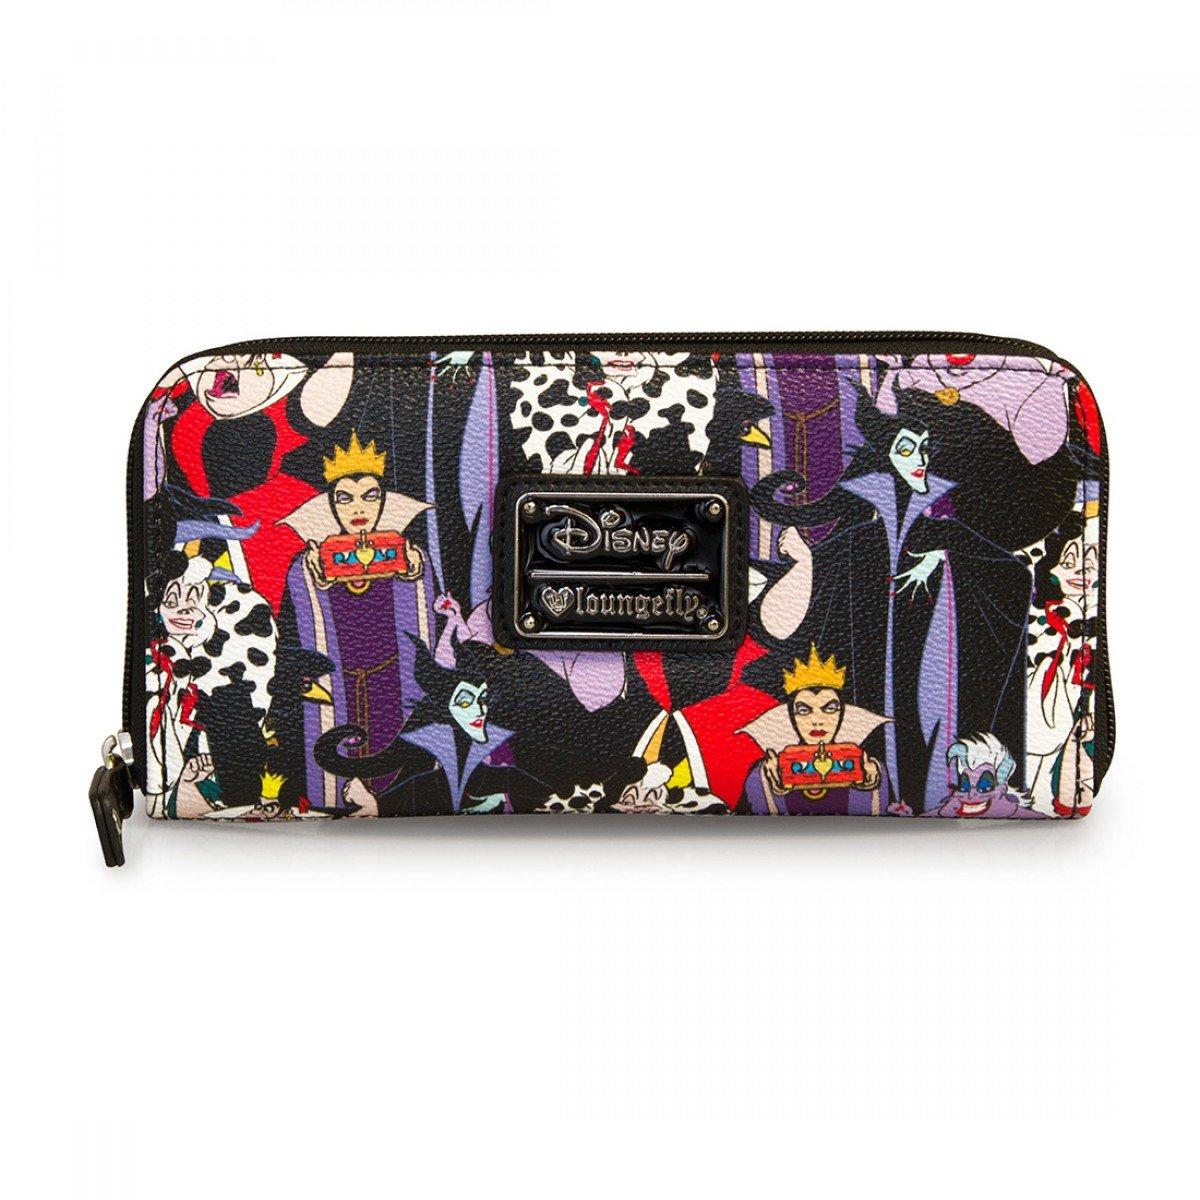 6123bbb5f5e Amazon.com  Disney Villains Zip Around Wallet Standard  Clothing